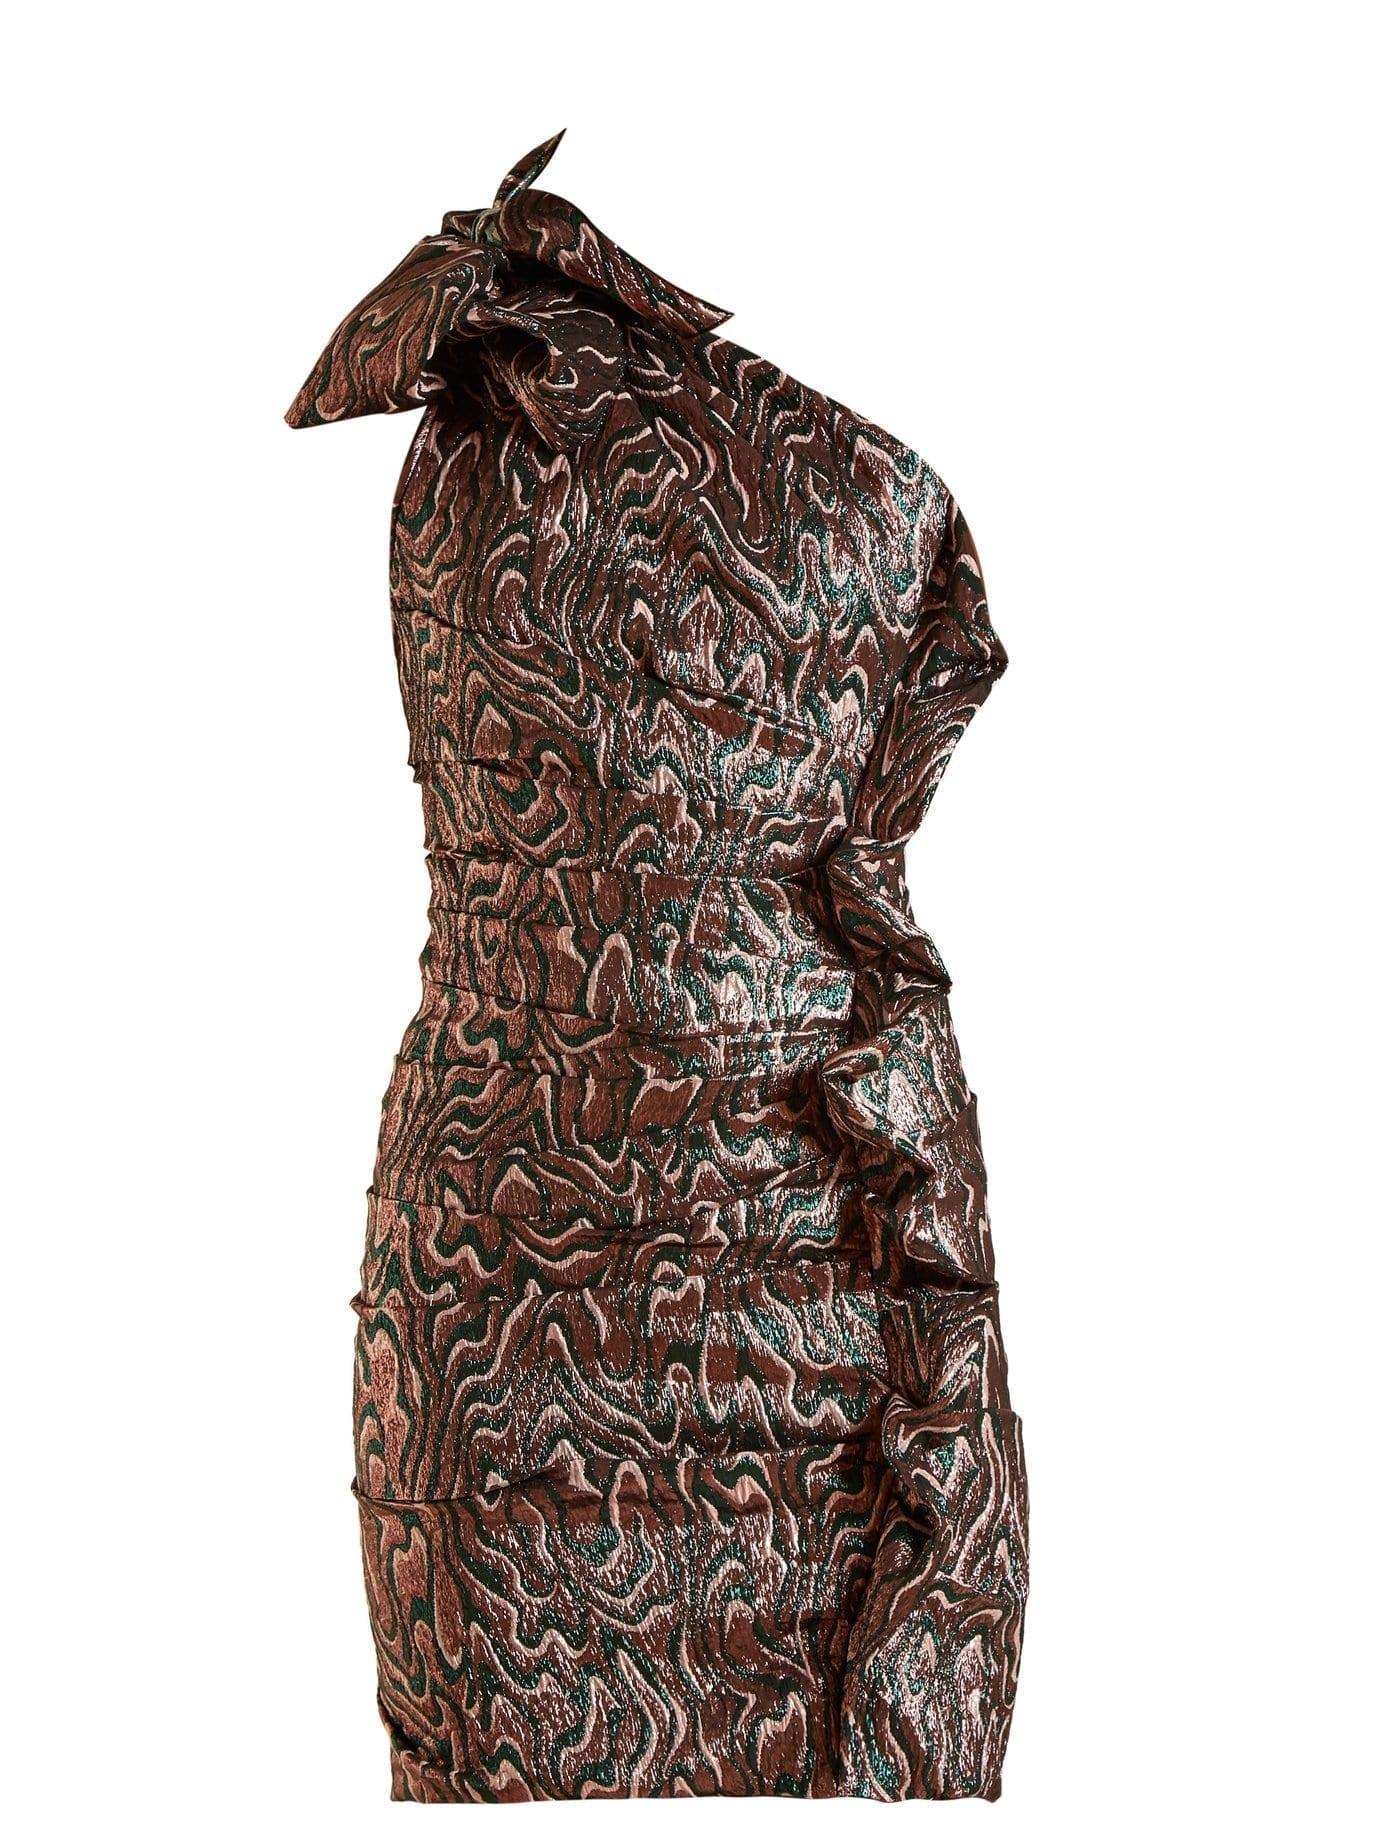 ISABEL MARANT Synee One Shoulder Jacquard Mini Pink / Green Dress